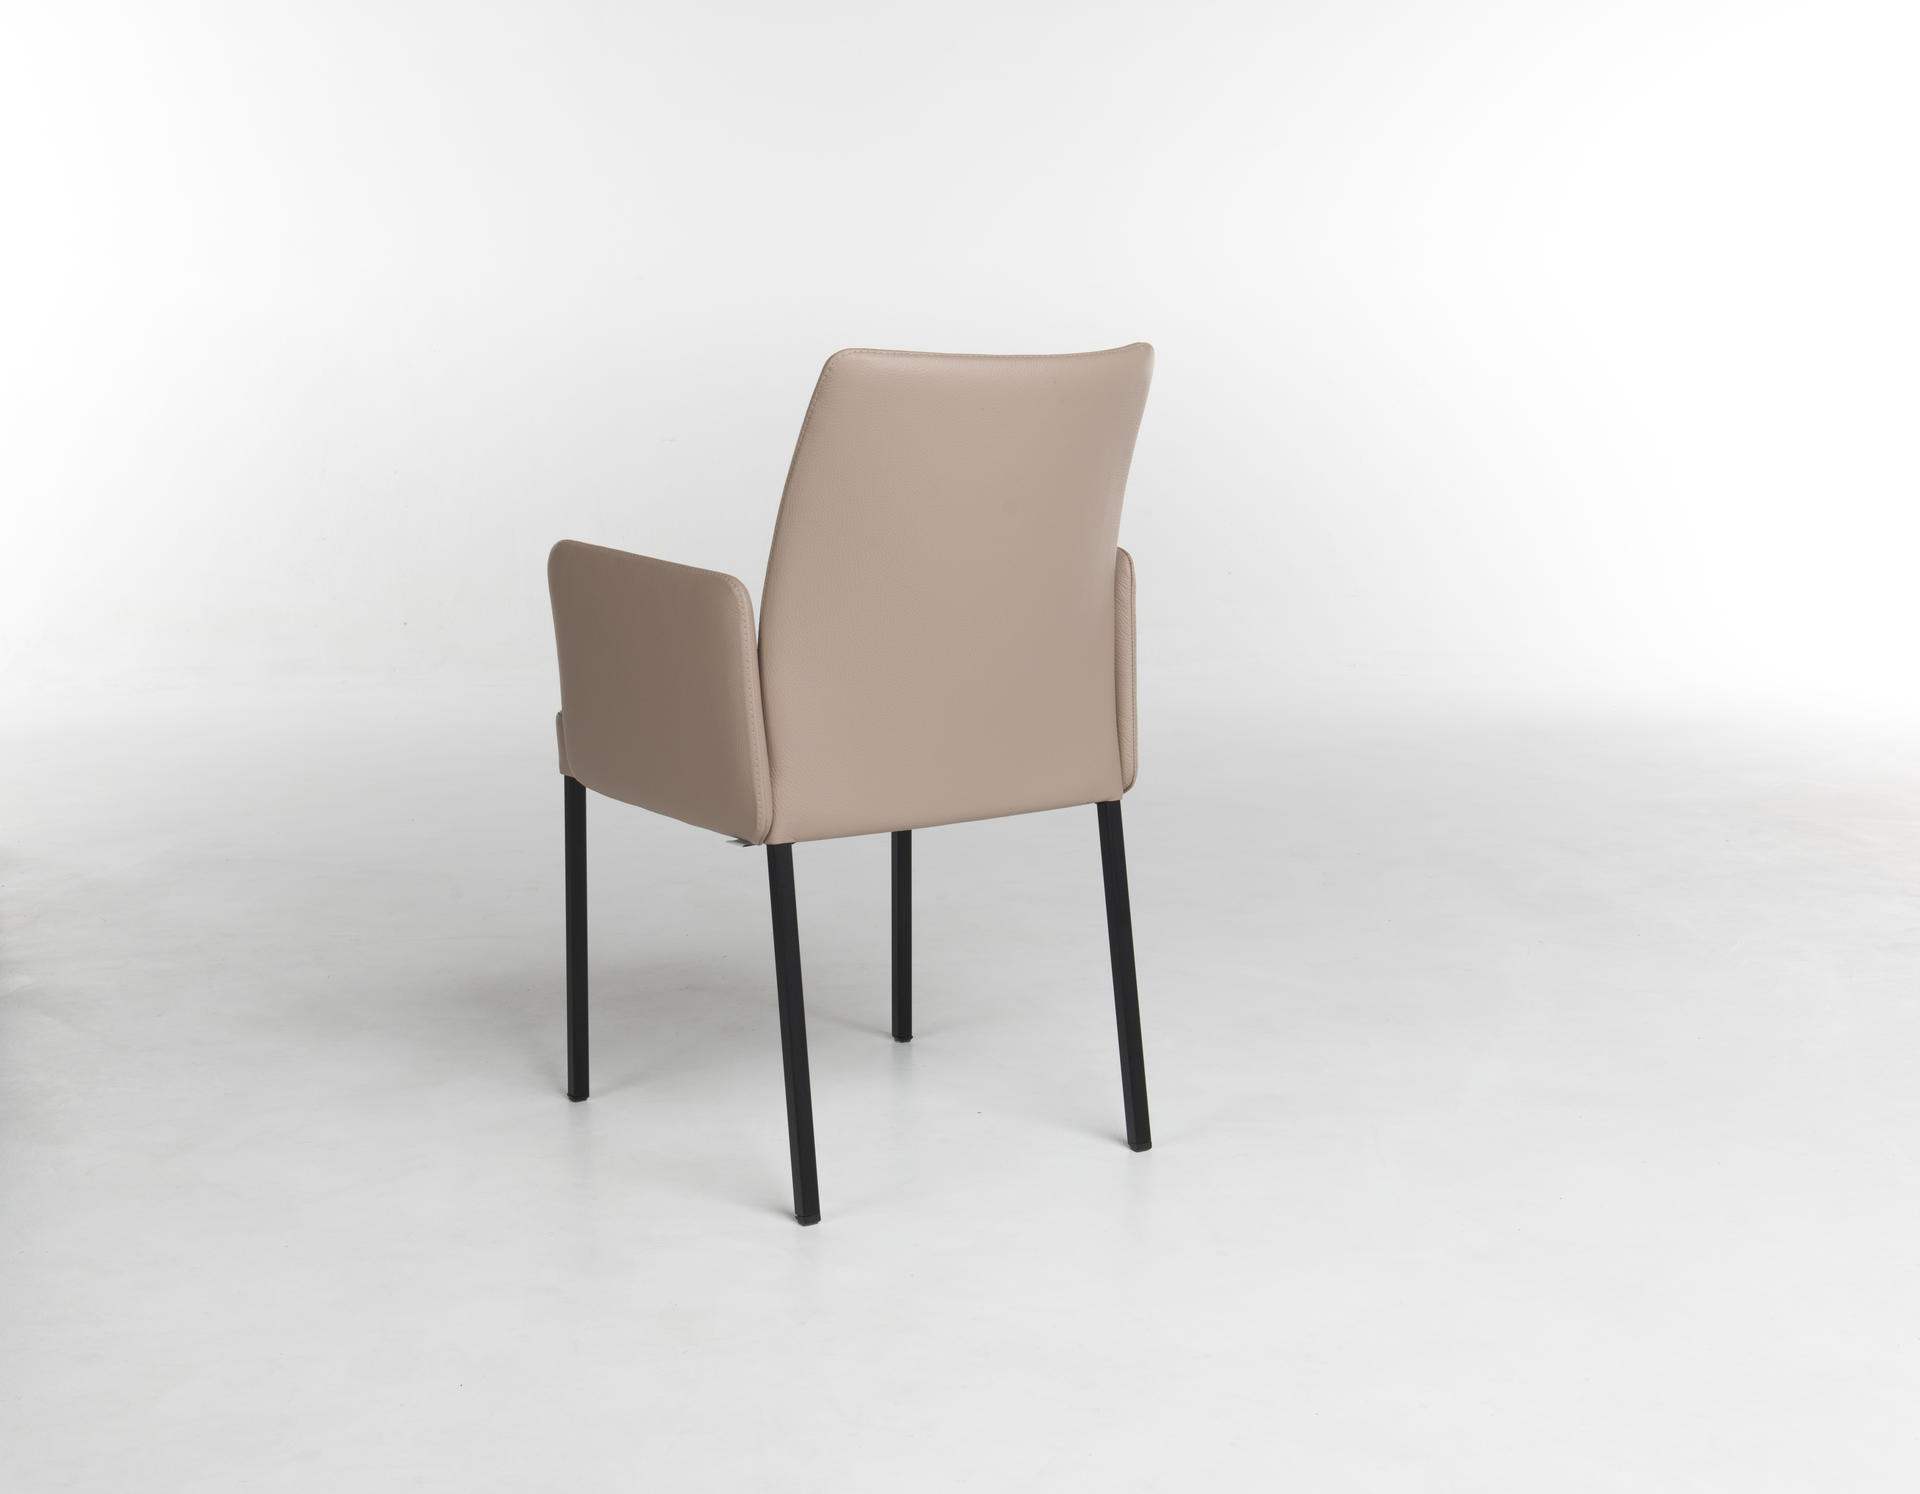 стул Ultimo, Bert Plantagie, фото 4